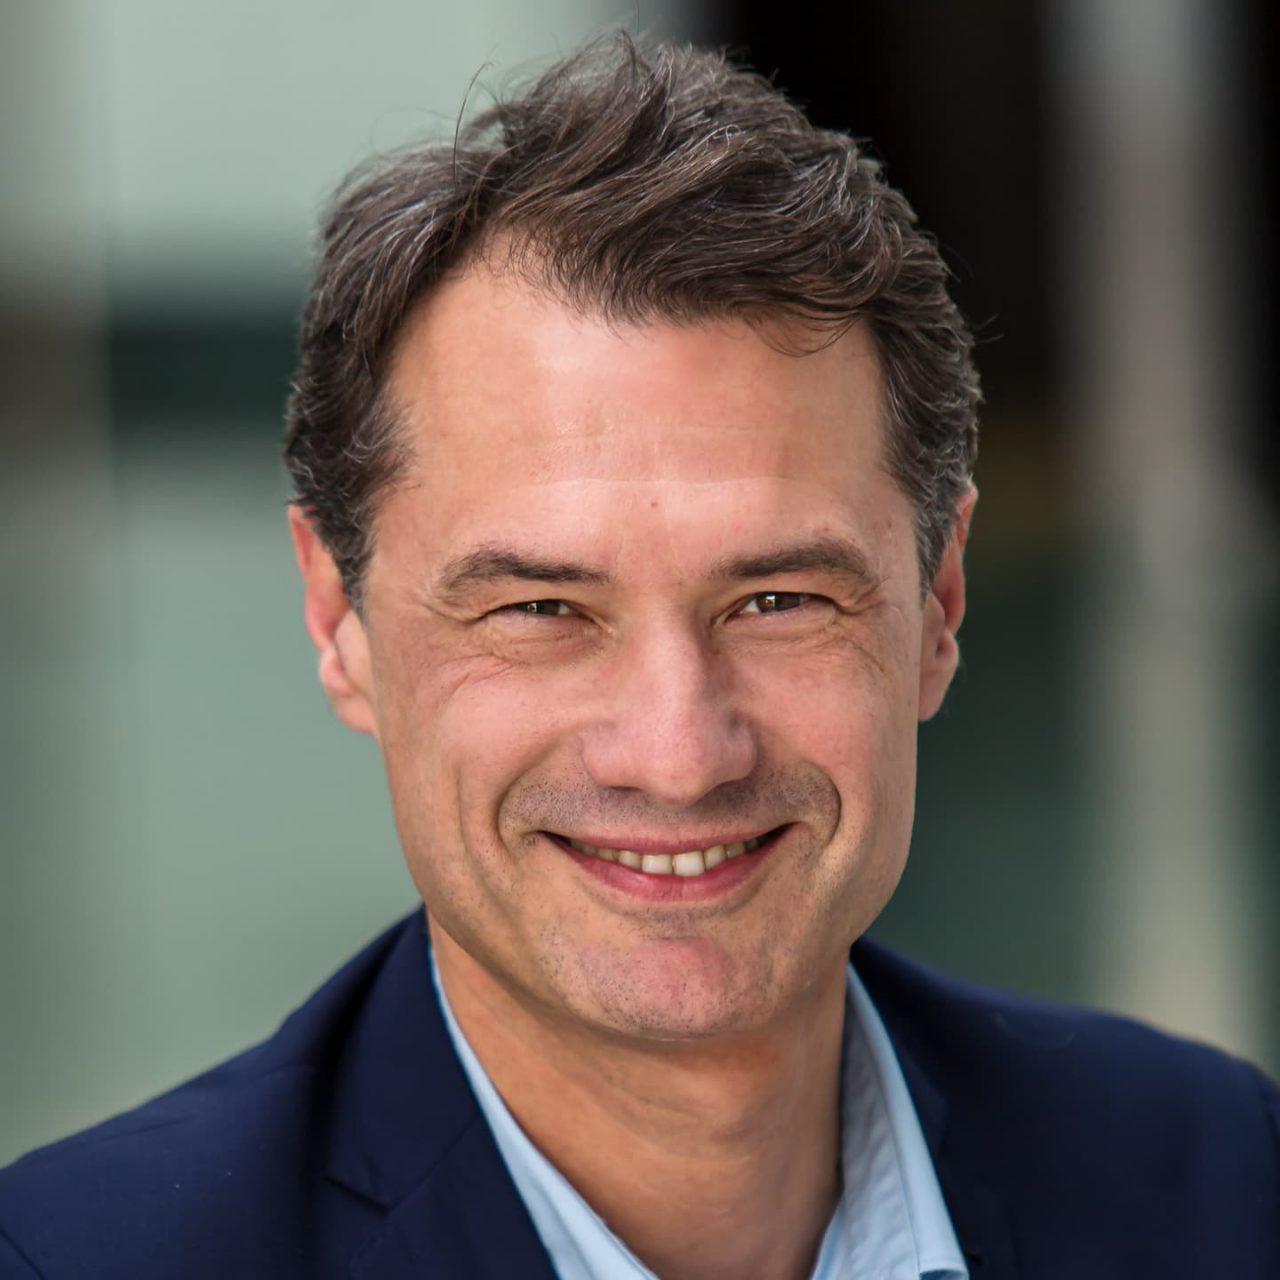 Mickael Lefebvre